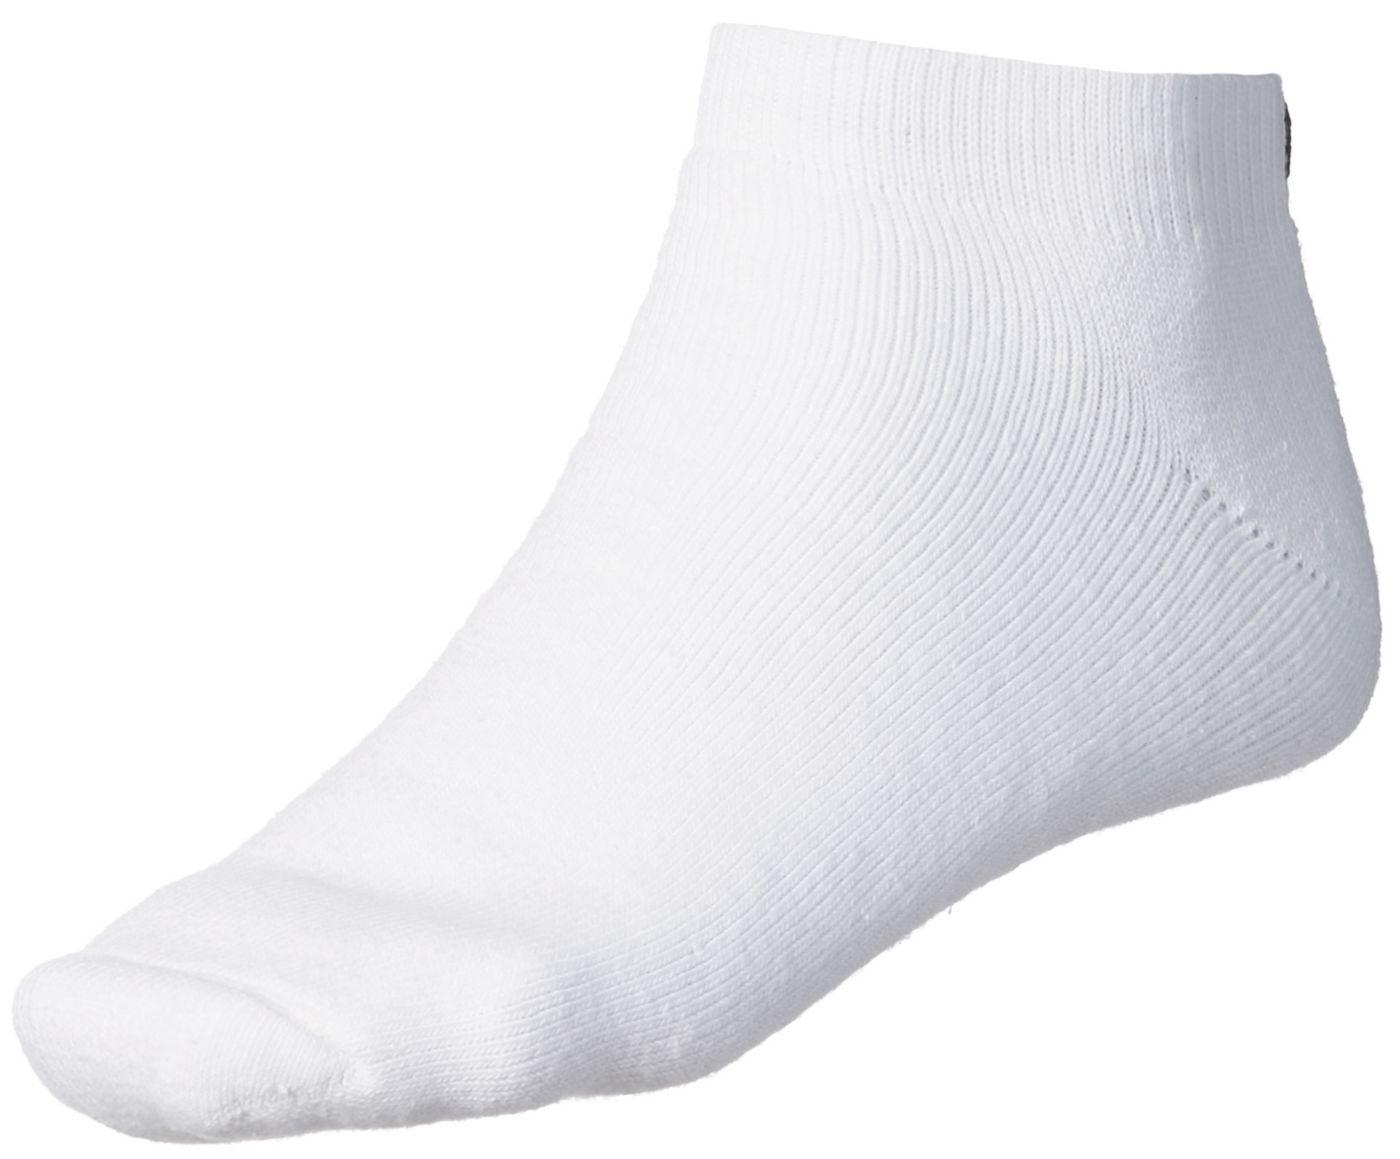 FootJoy Men's Sport Sock - 6 Pack